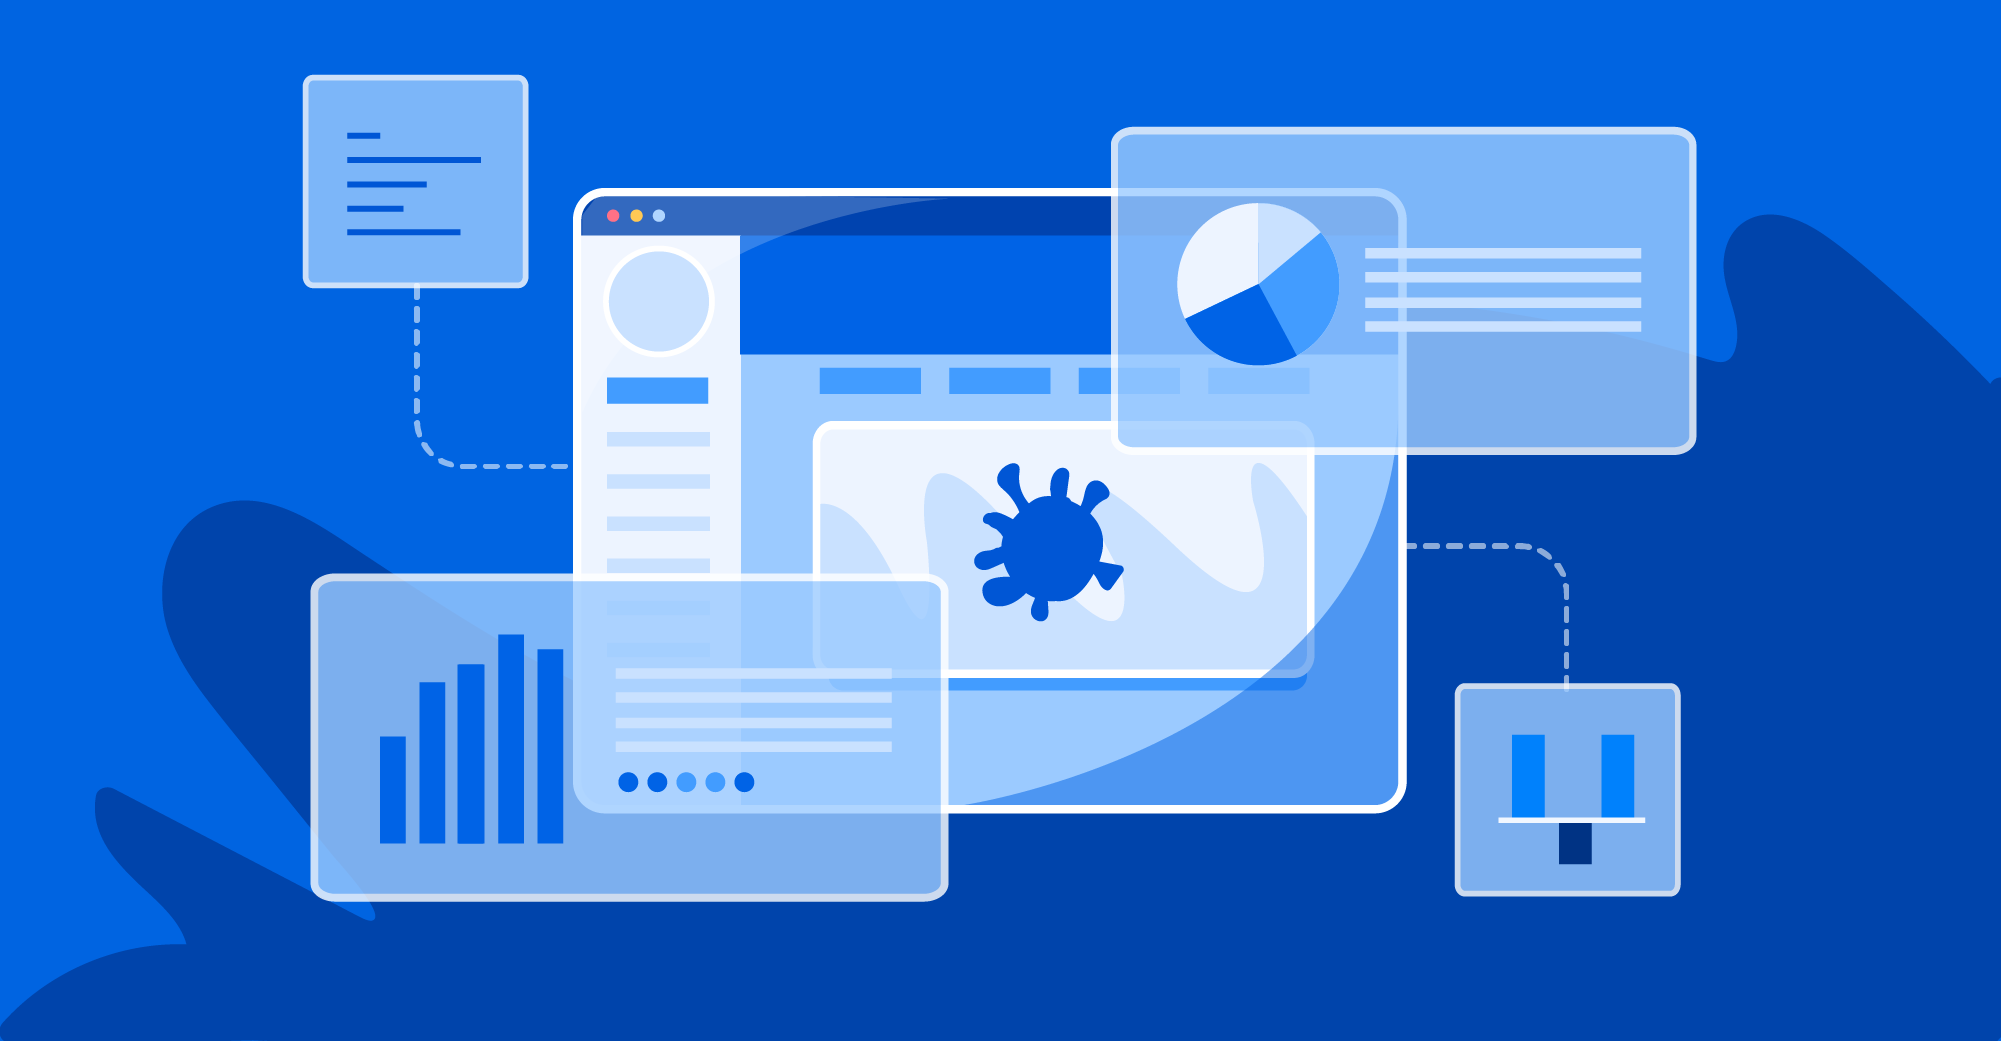 Illustration of application screens